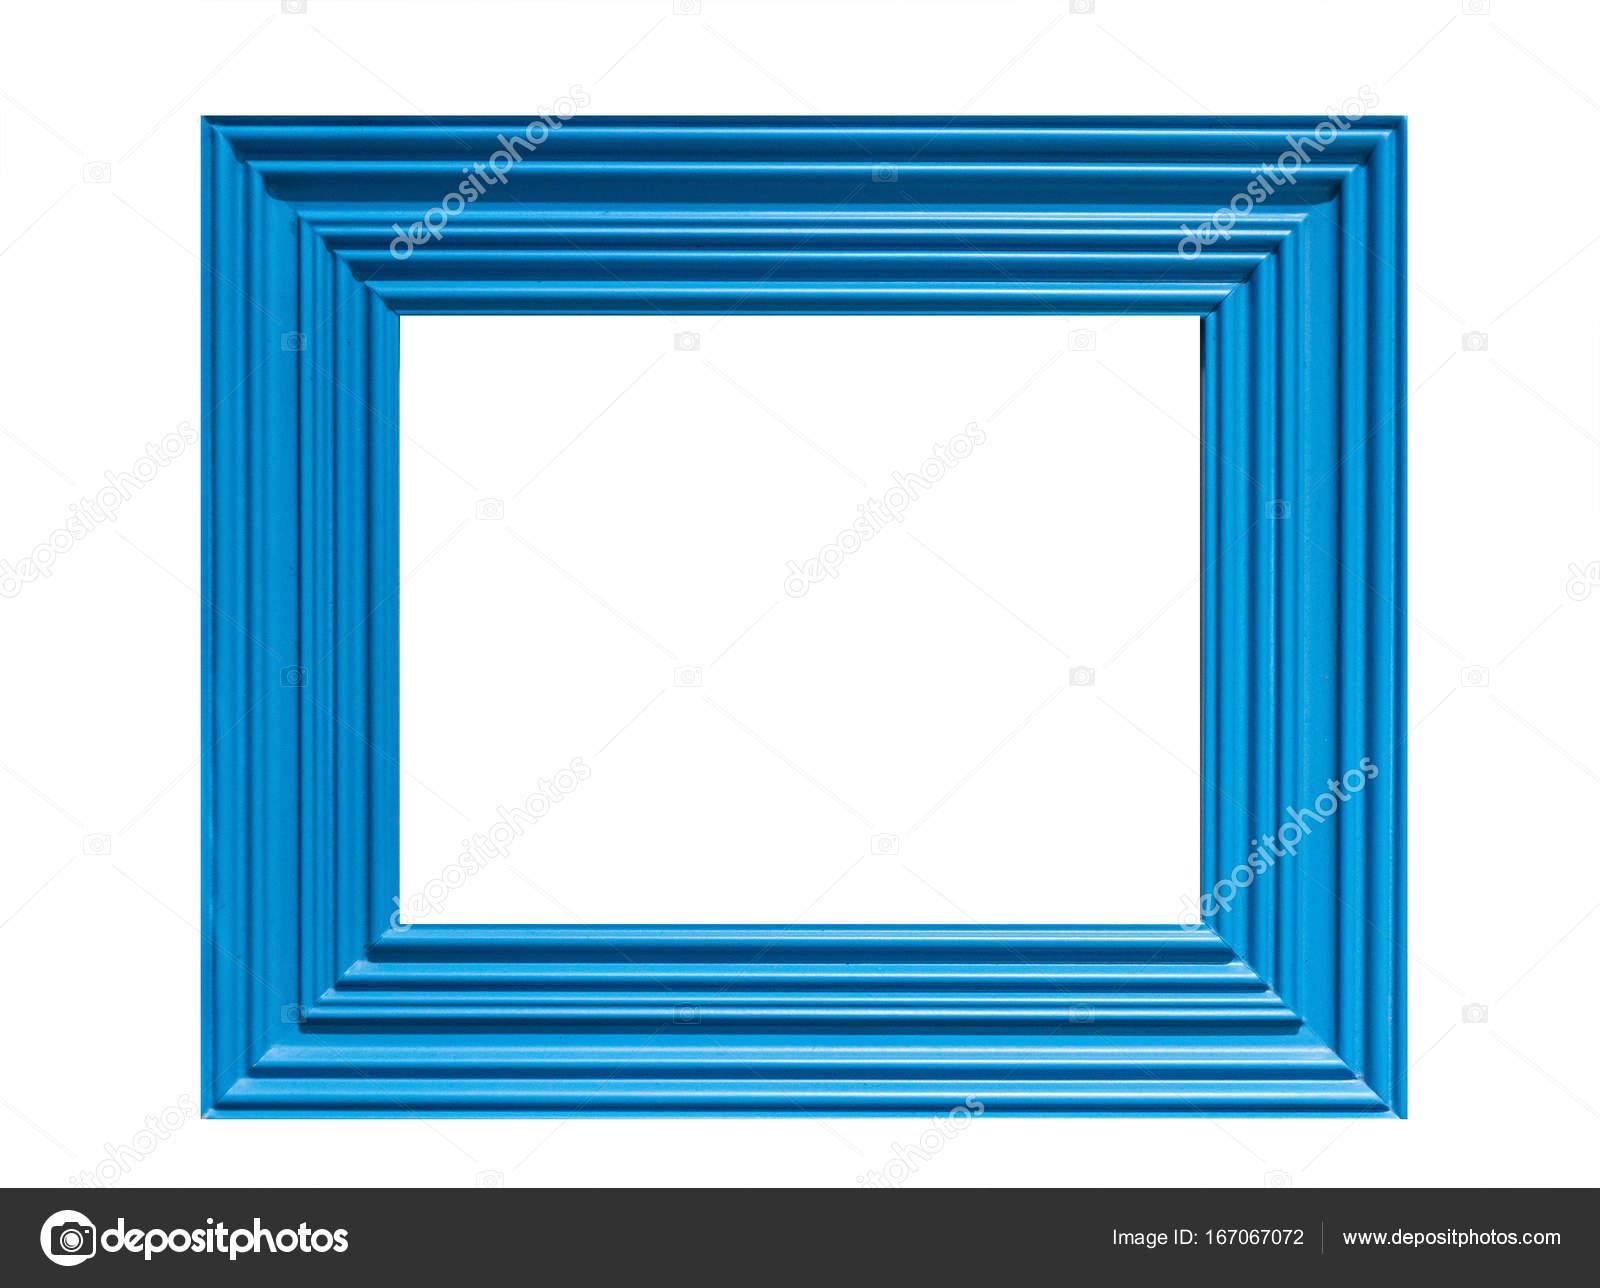 marco de color azul sobre fondo blanco — Fotos de Stock © LaKirr ...